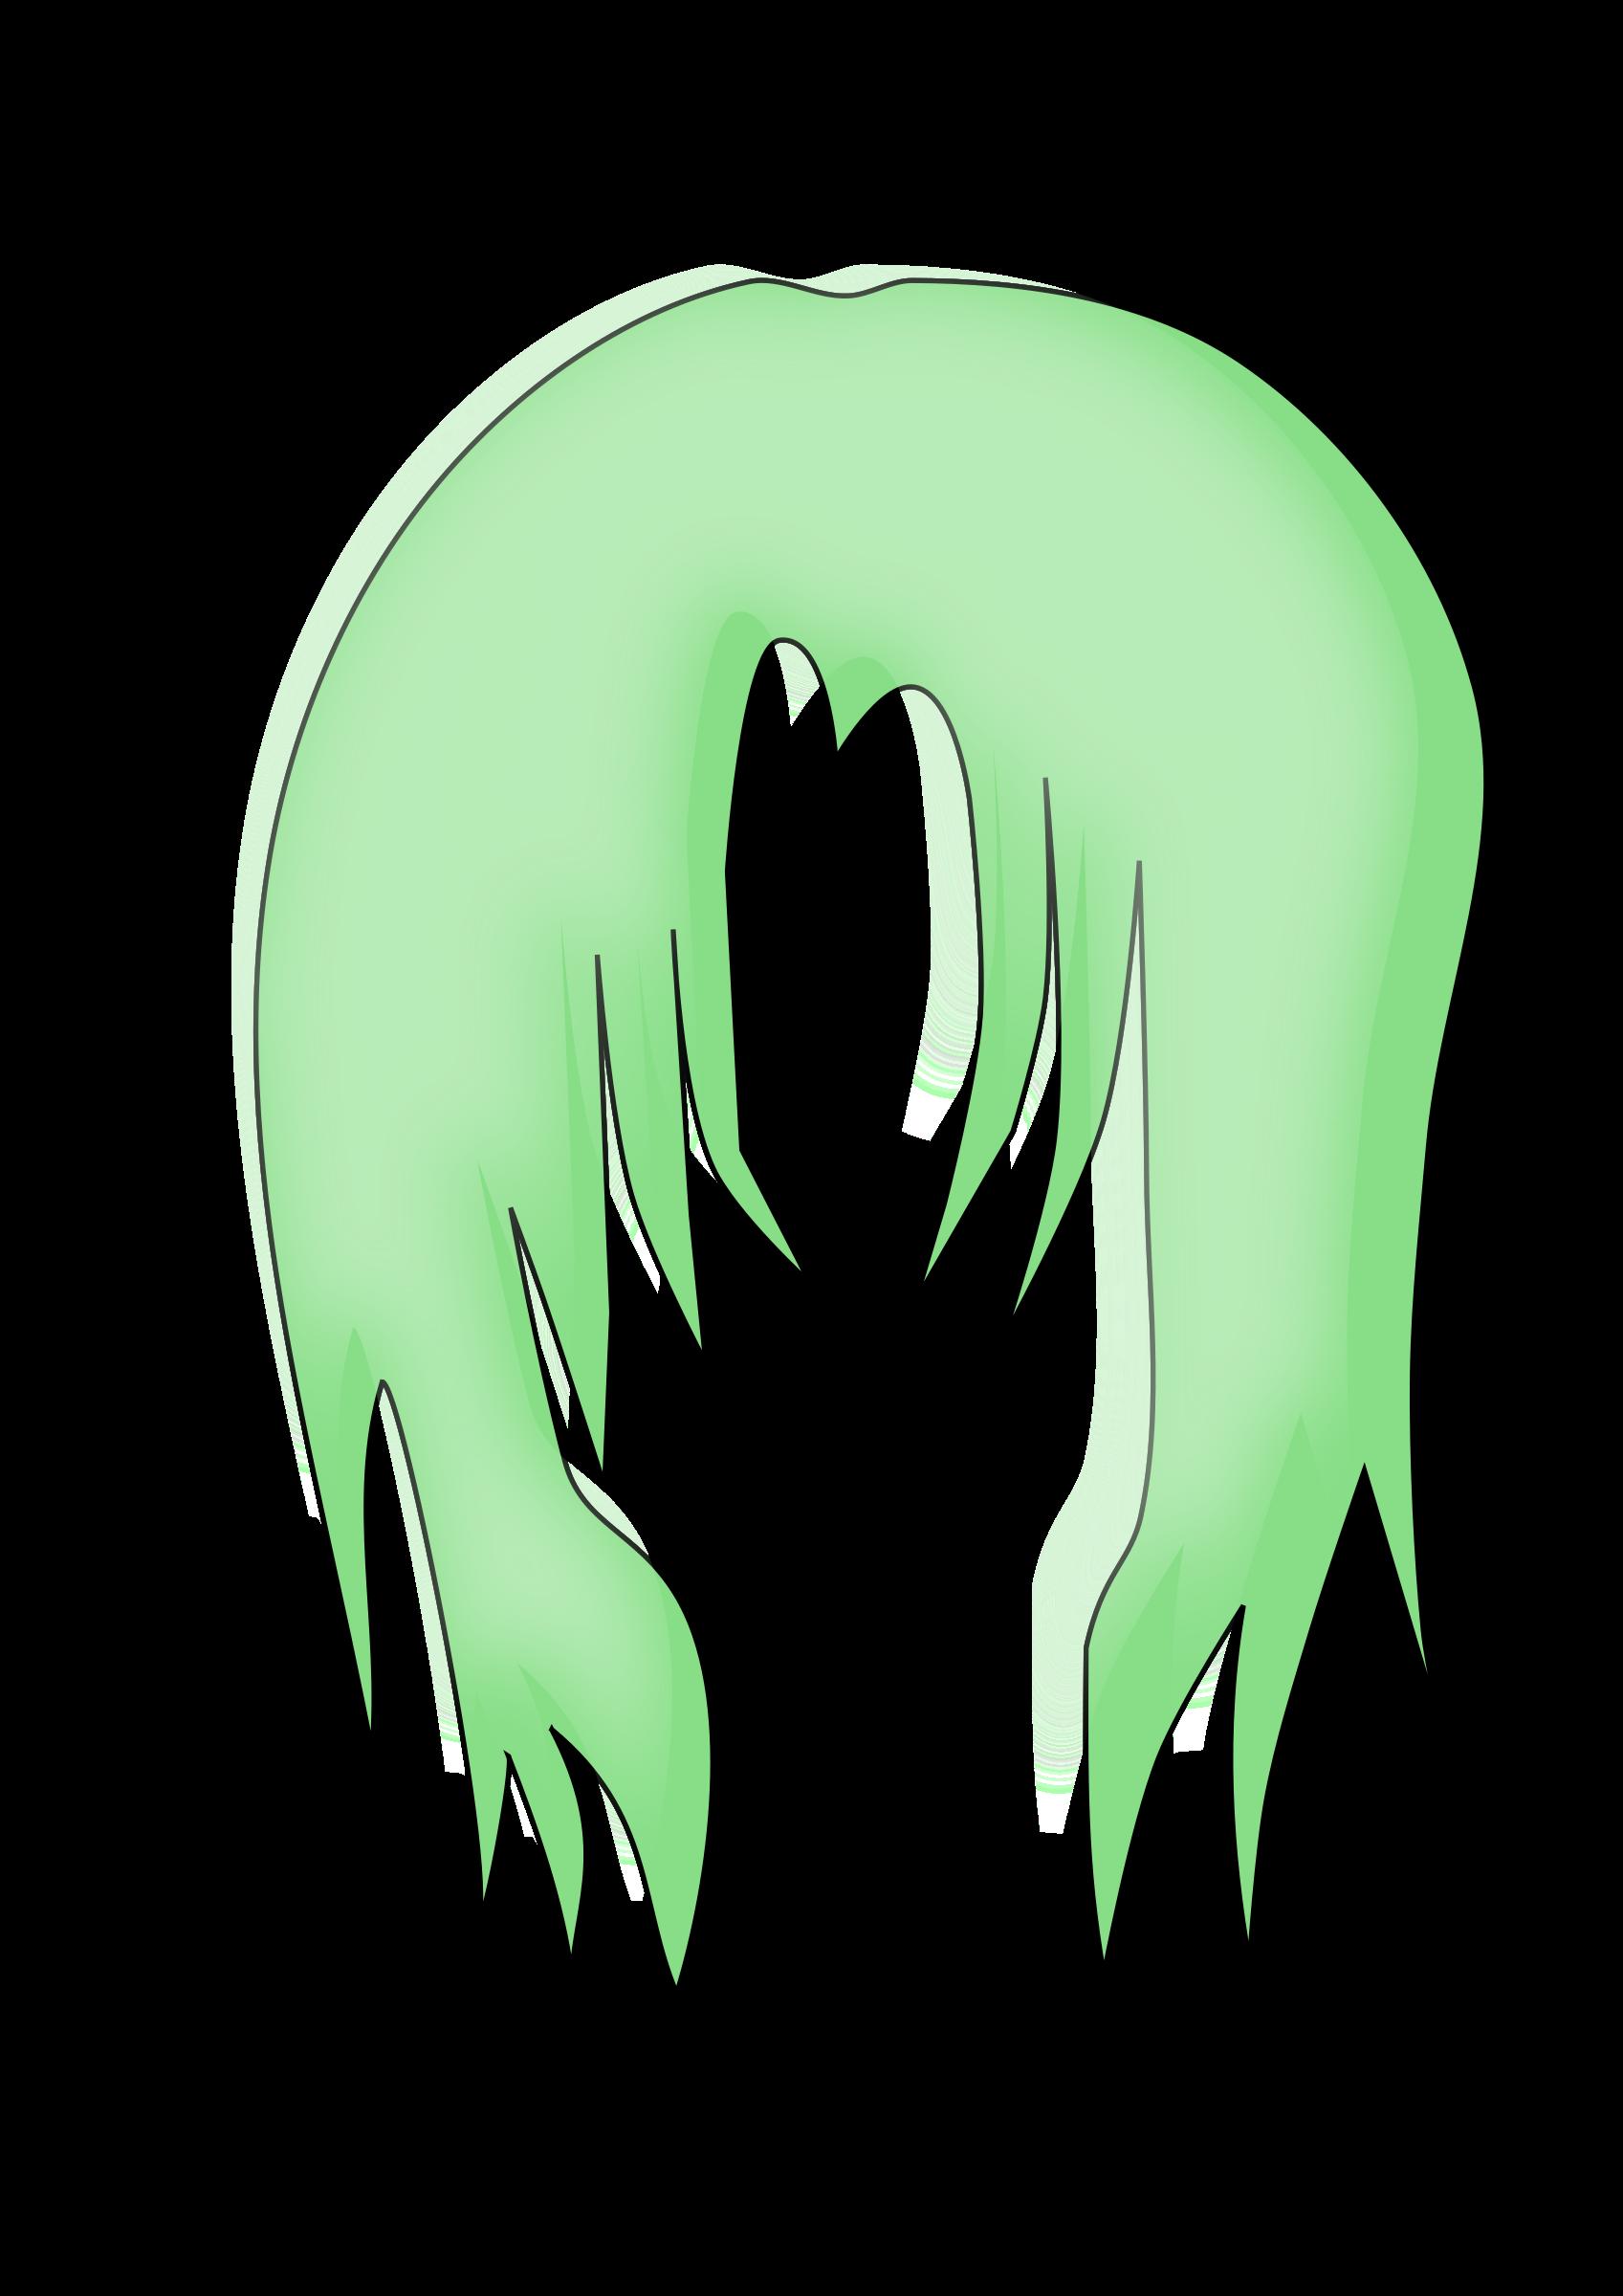 Anime Hair PNG - 169004